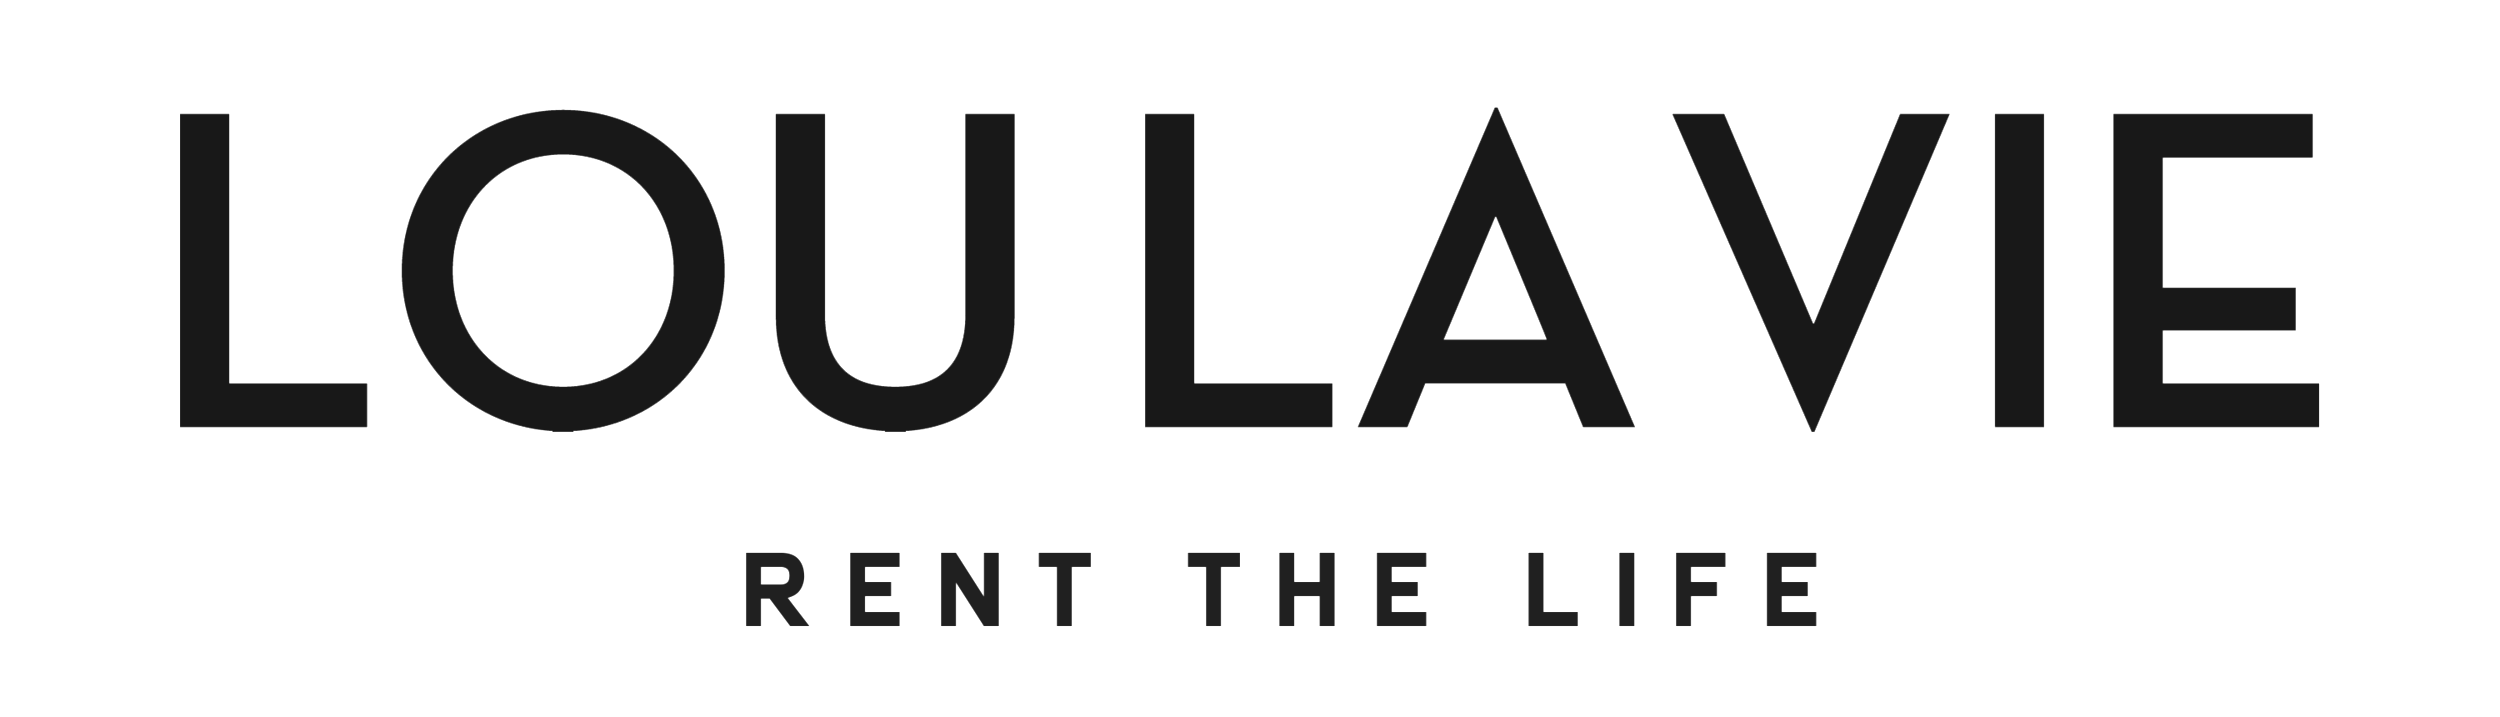 lou-la-vie-Logo-Text-rent-the-life.png